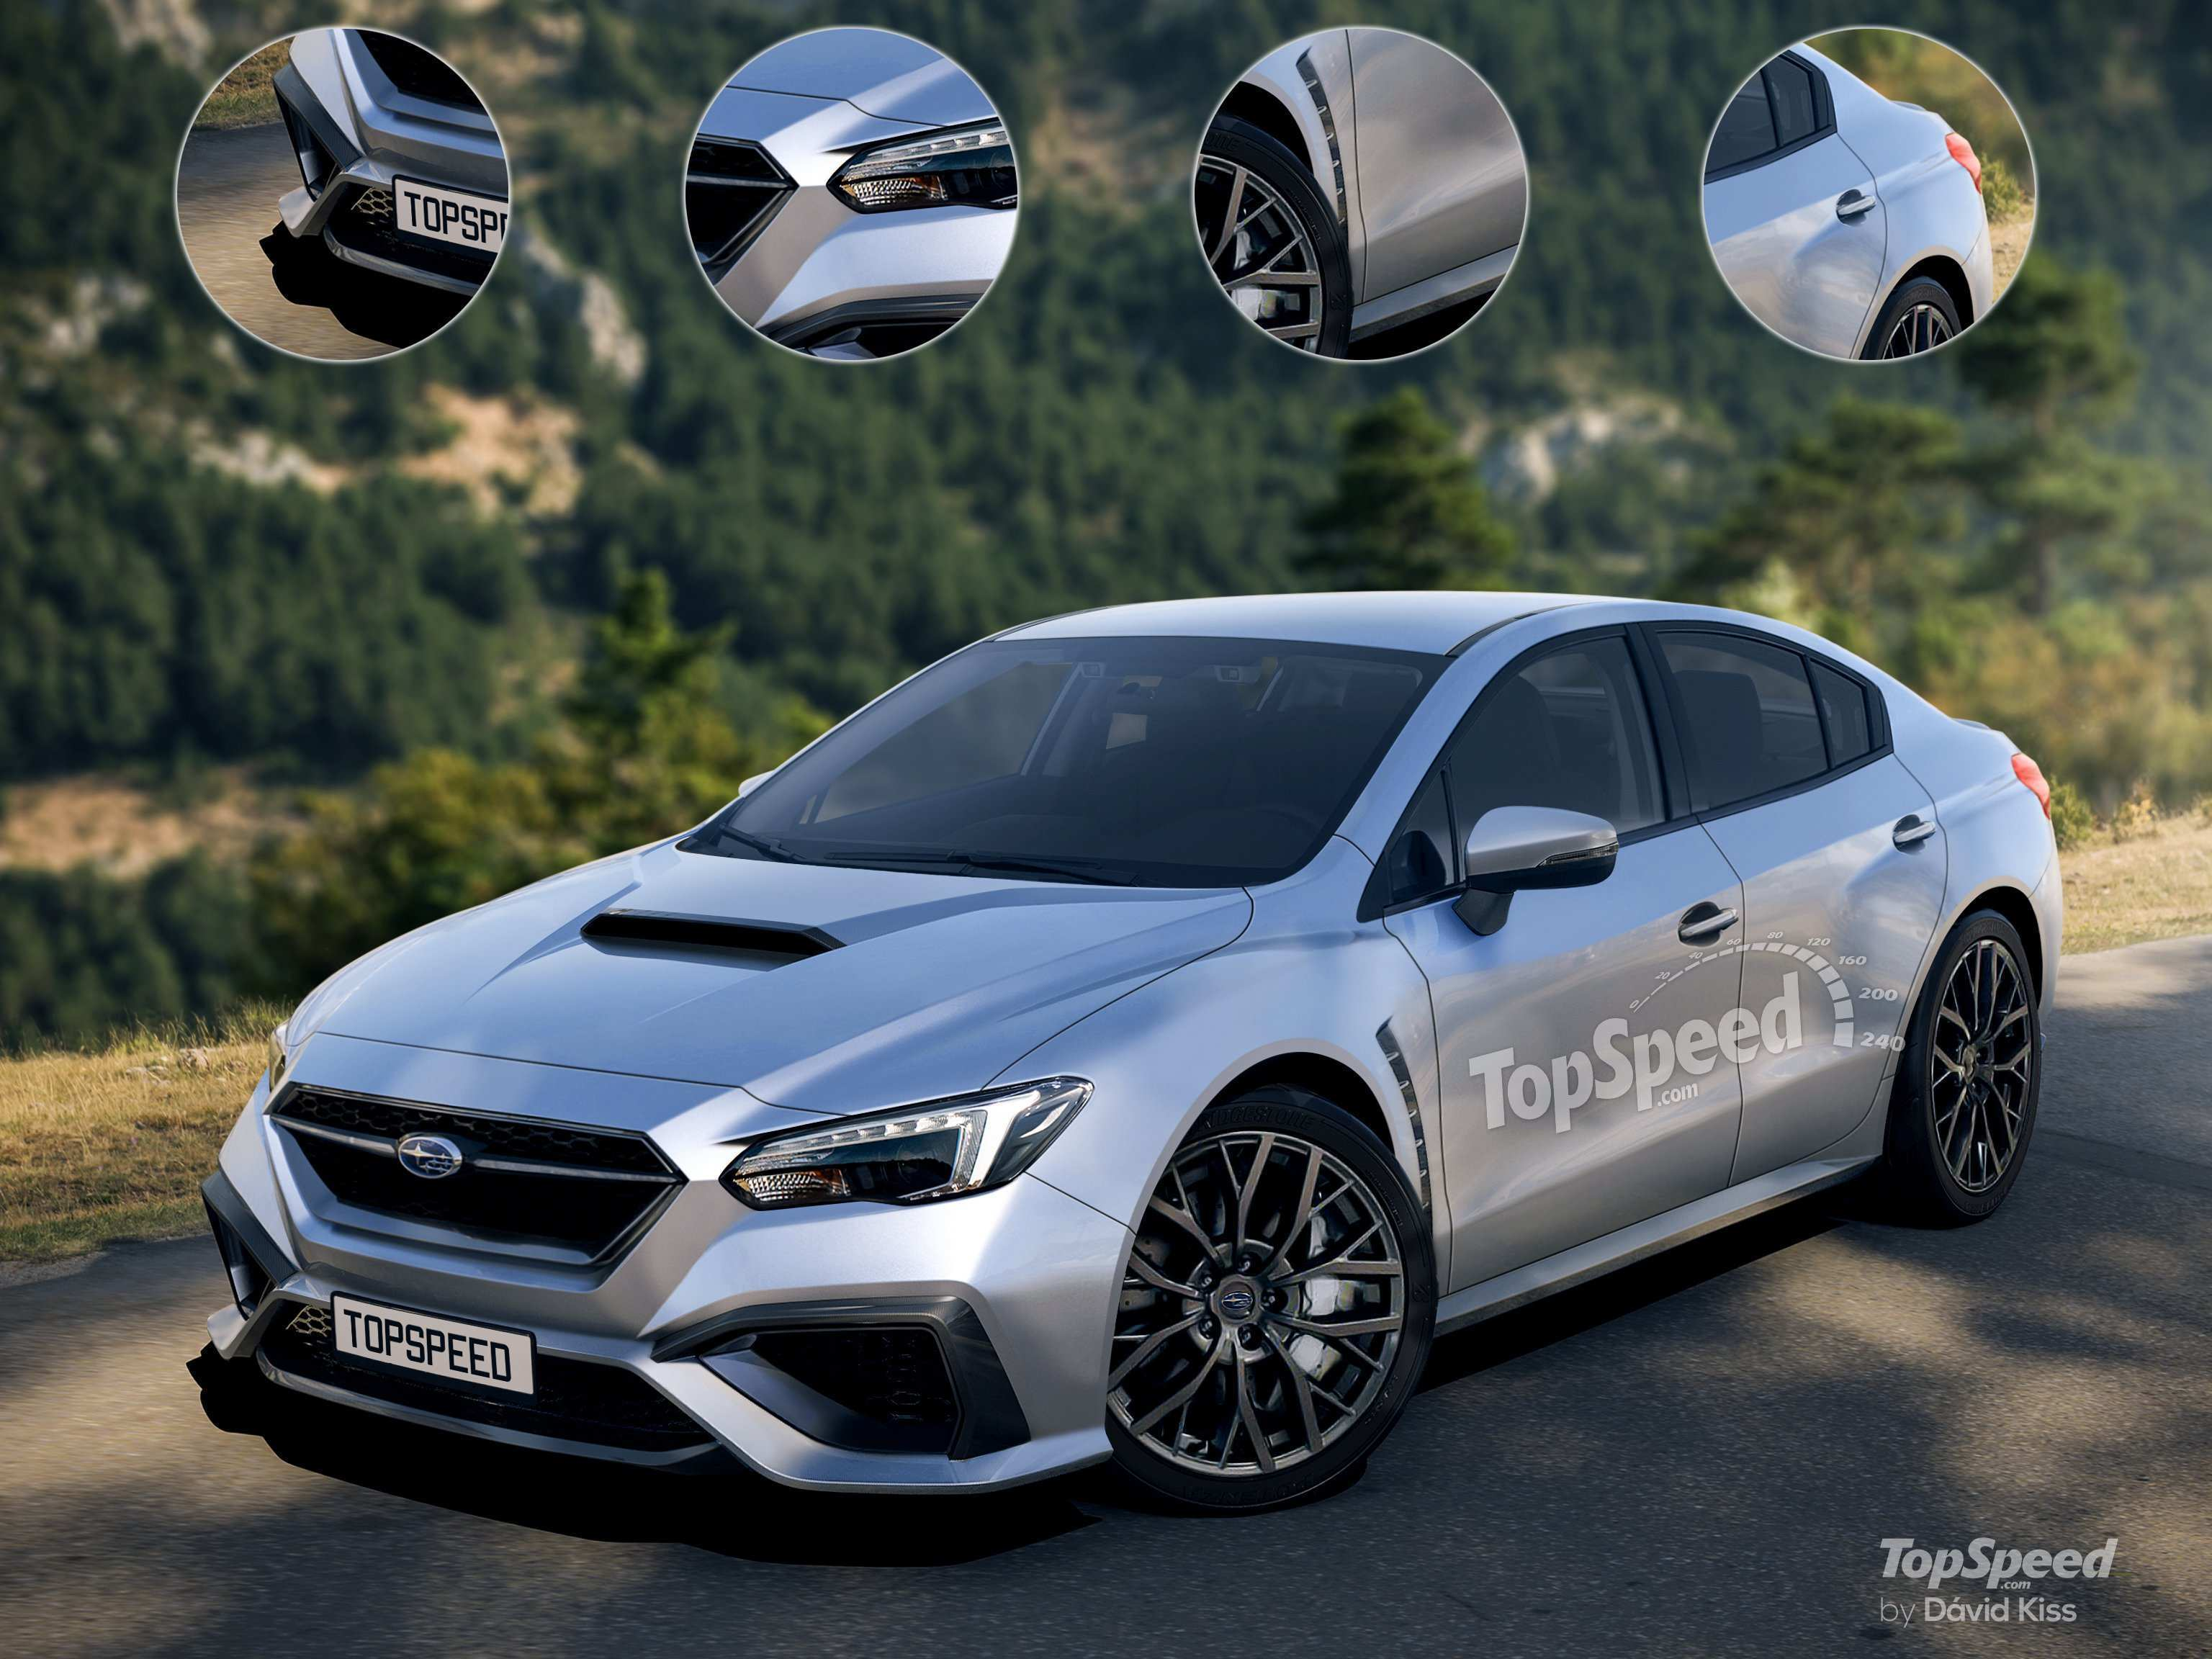 91 Best Review Subaru 2020 Vehicles Spy Shoot with Subaru 2020 Vehicles